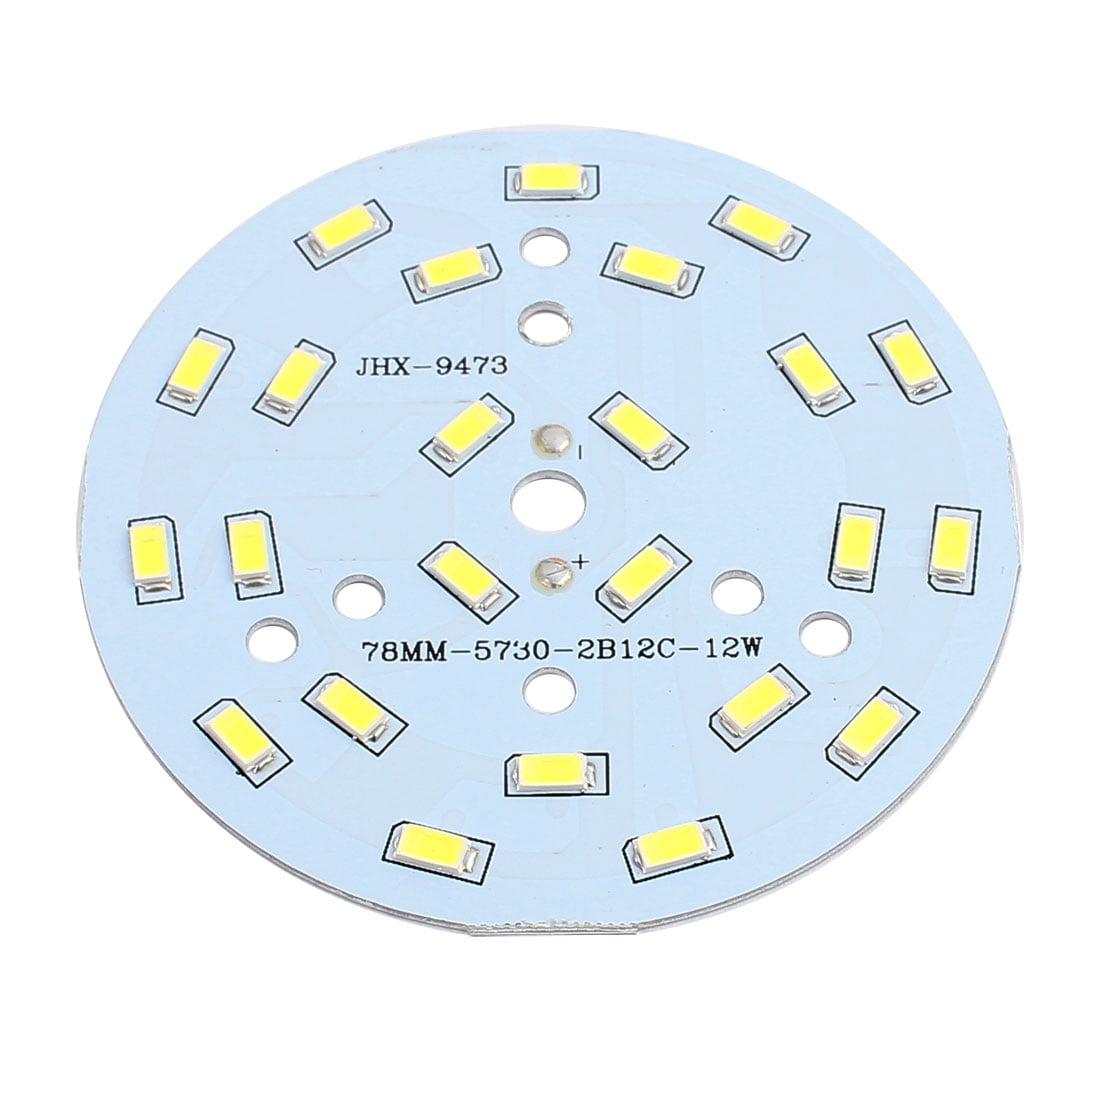 78mm Dia 12W 24 LEDs 5730 SMD LED blanc lumière plafond Aluminium - image 2 de 2